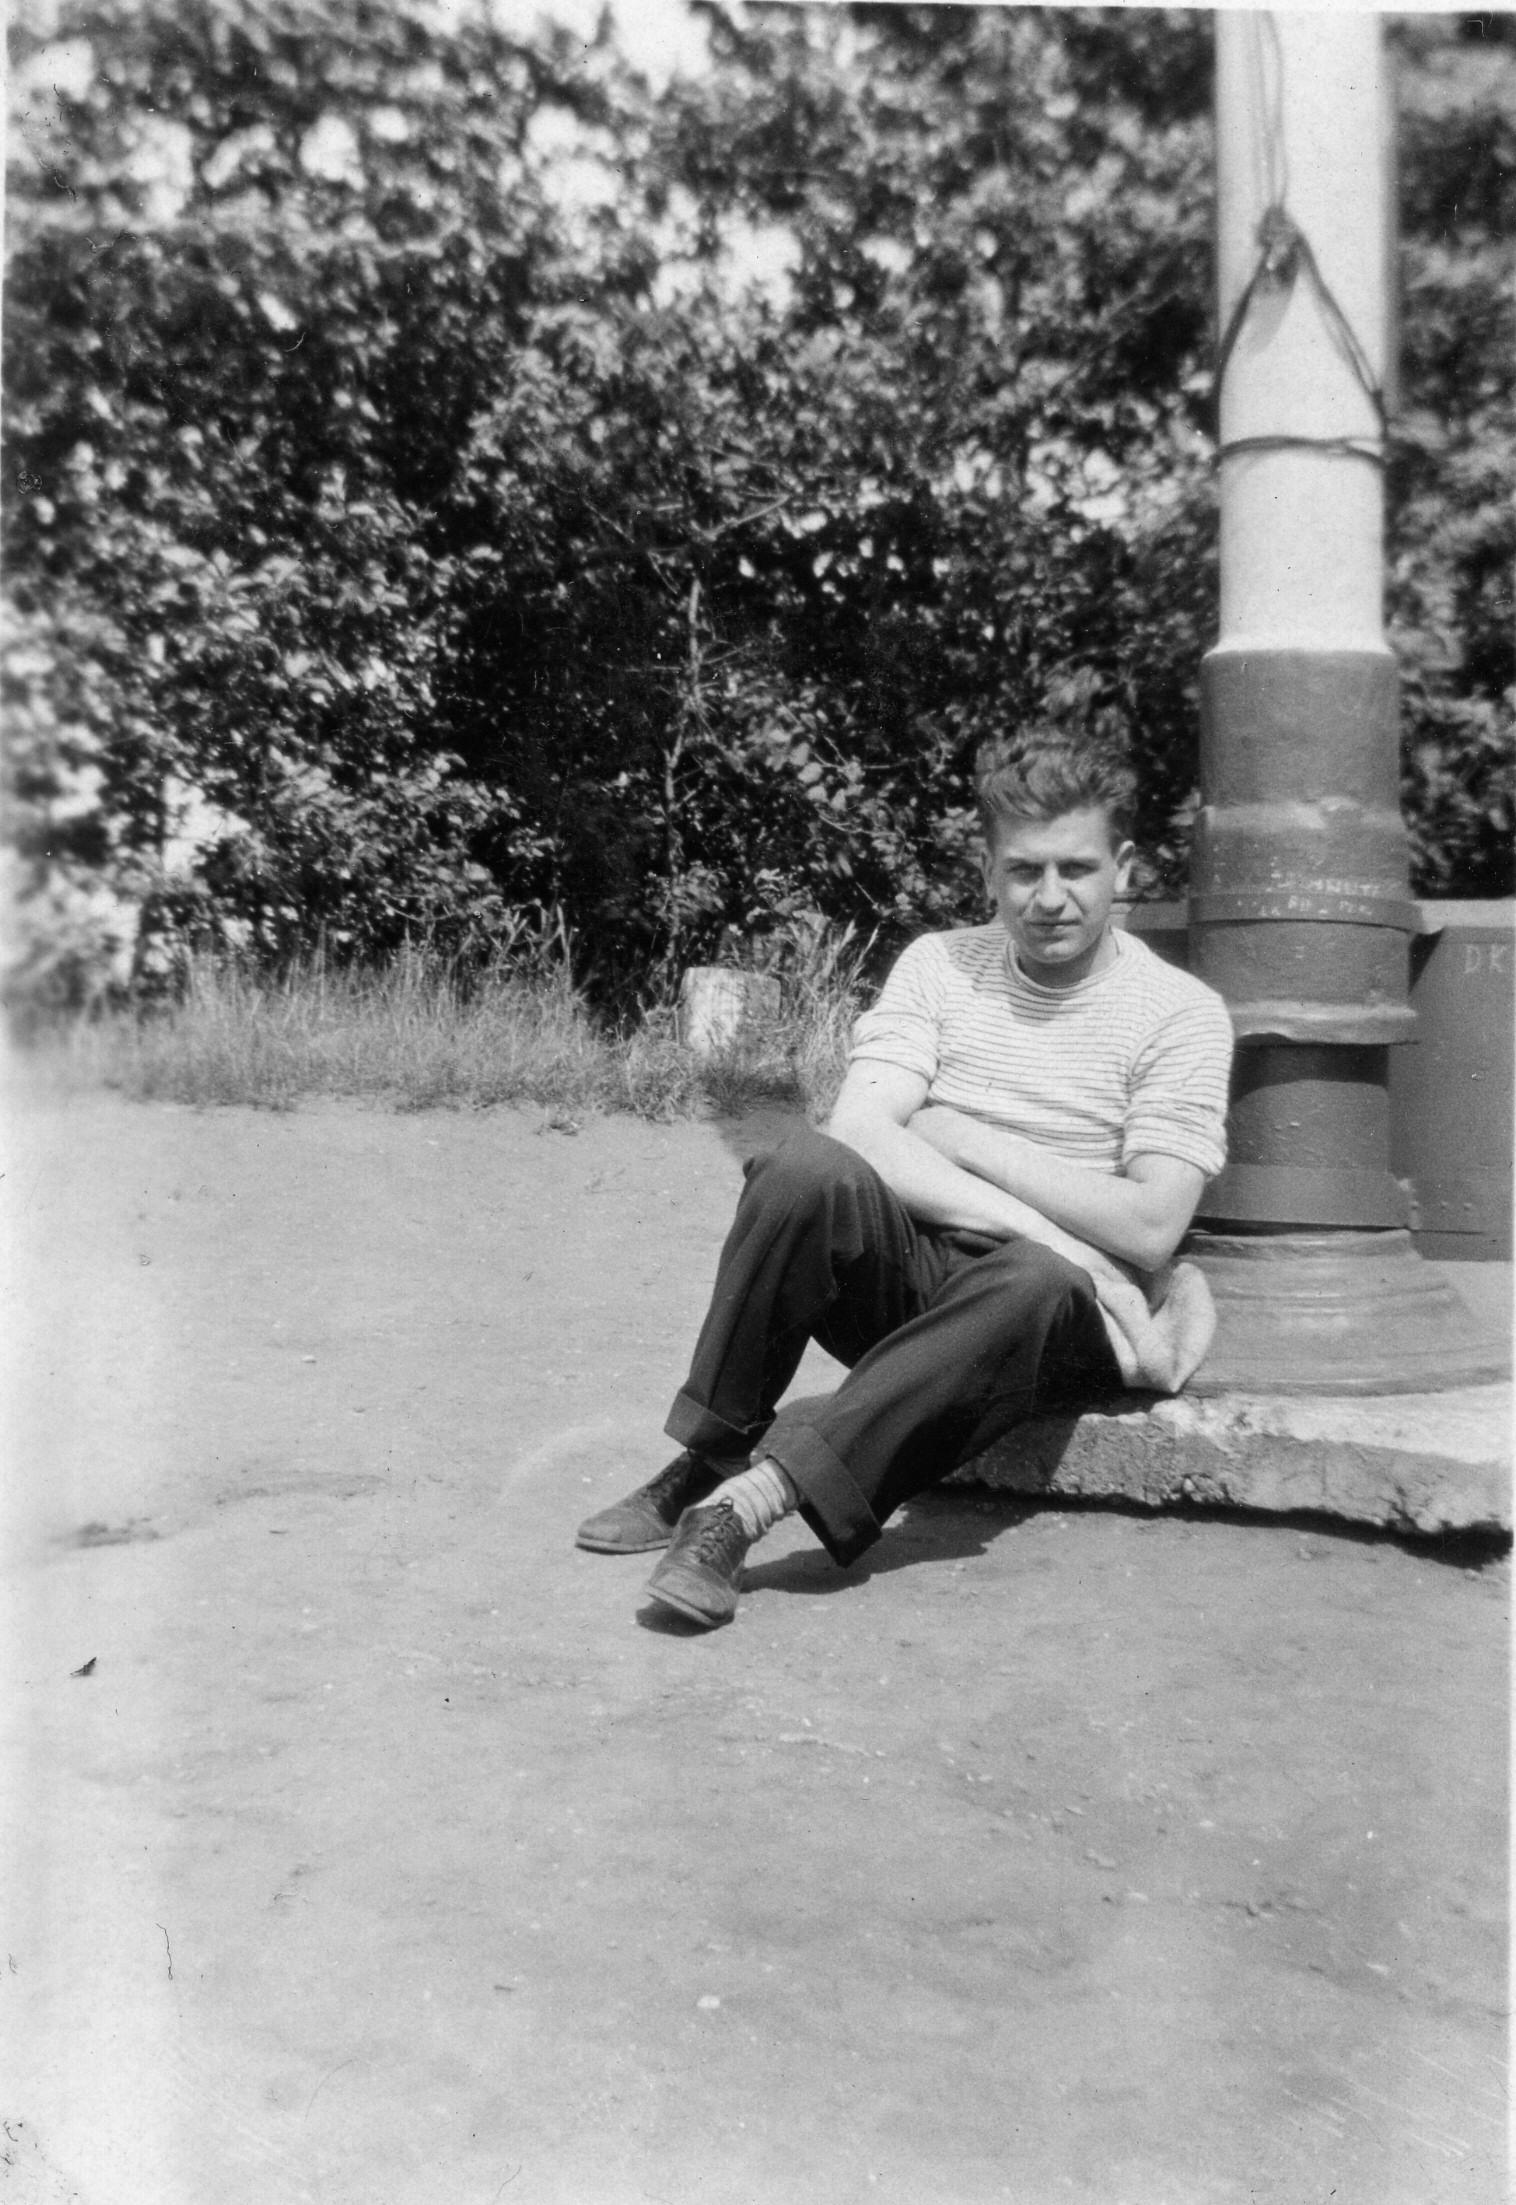 Frank Salemme